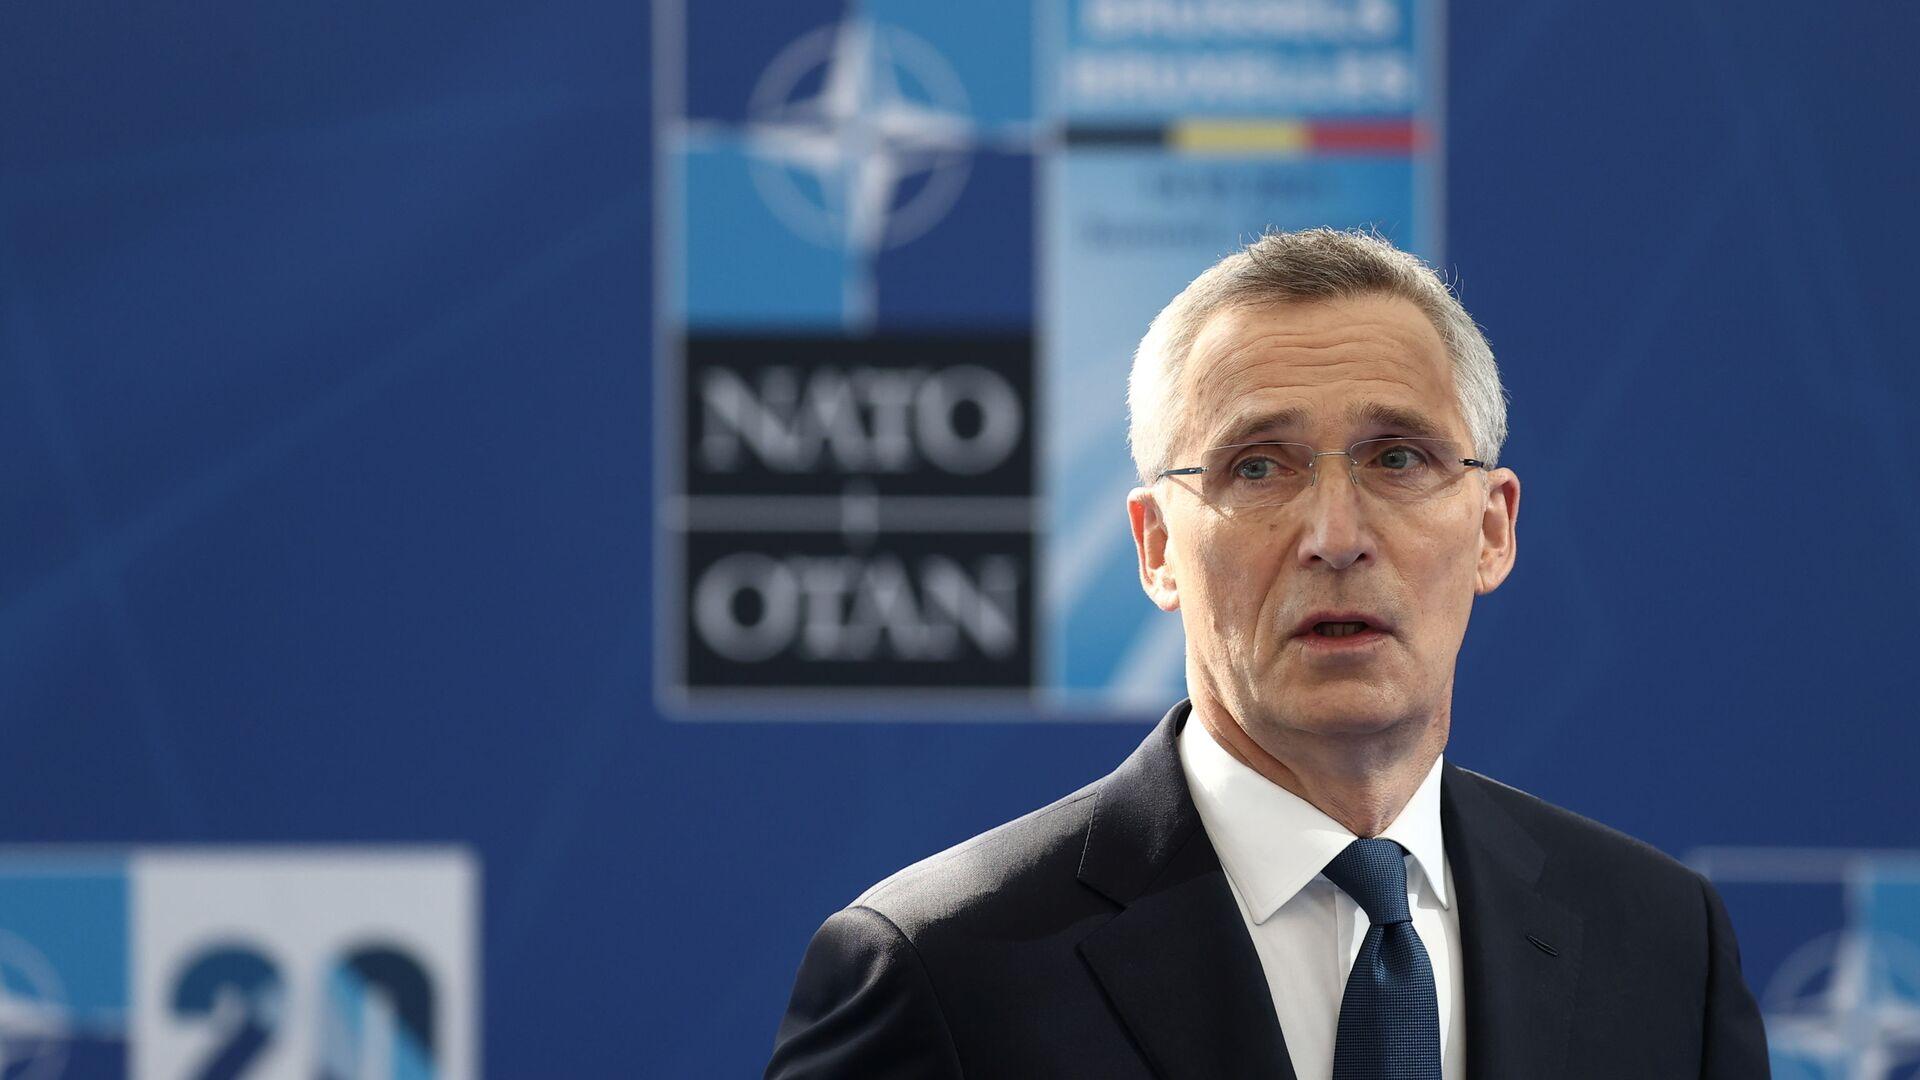 Sekretarz Generalny NATO Jens Stoltenberg - Sputnik Polska, 1920, 16.06.2021